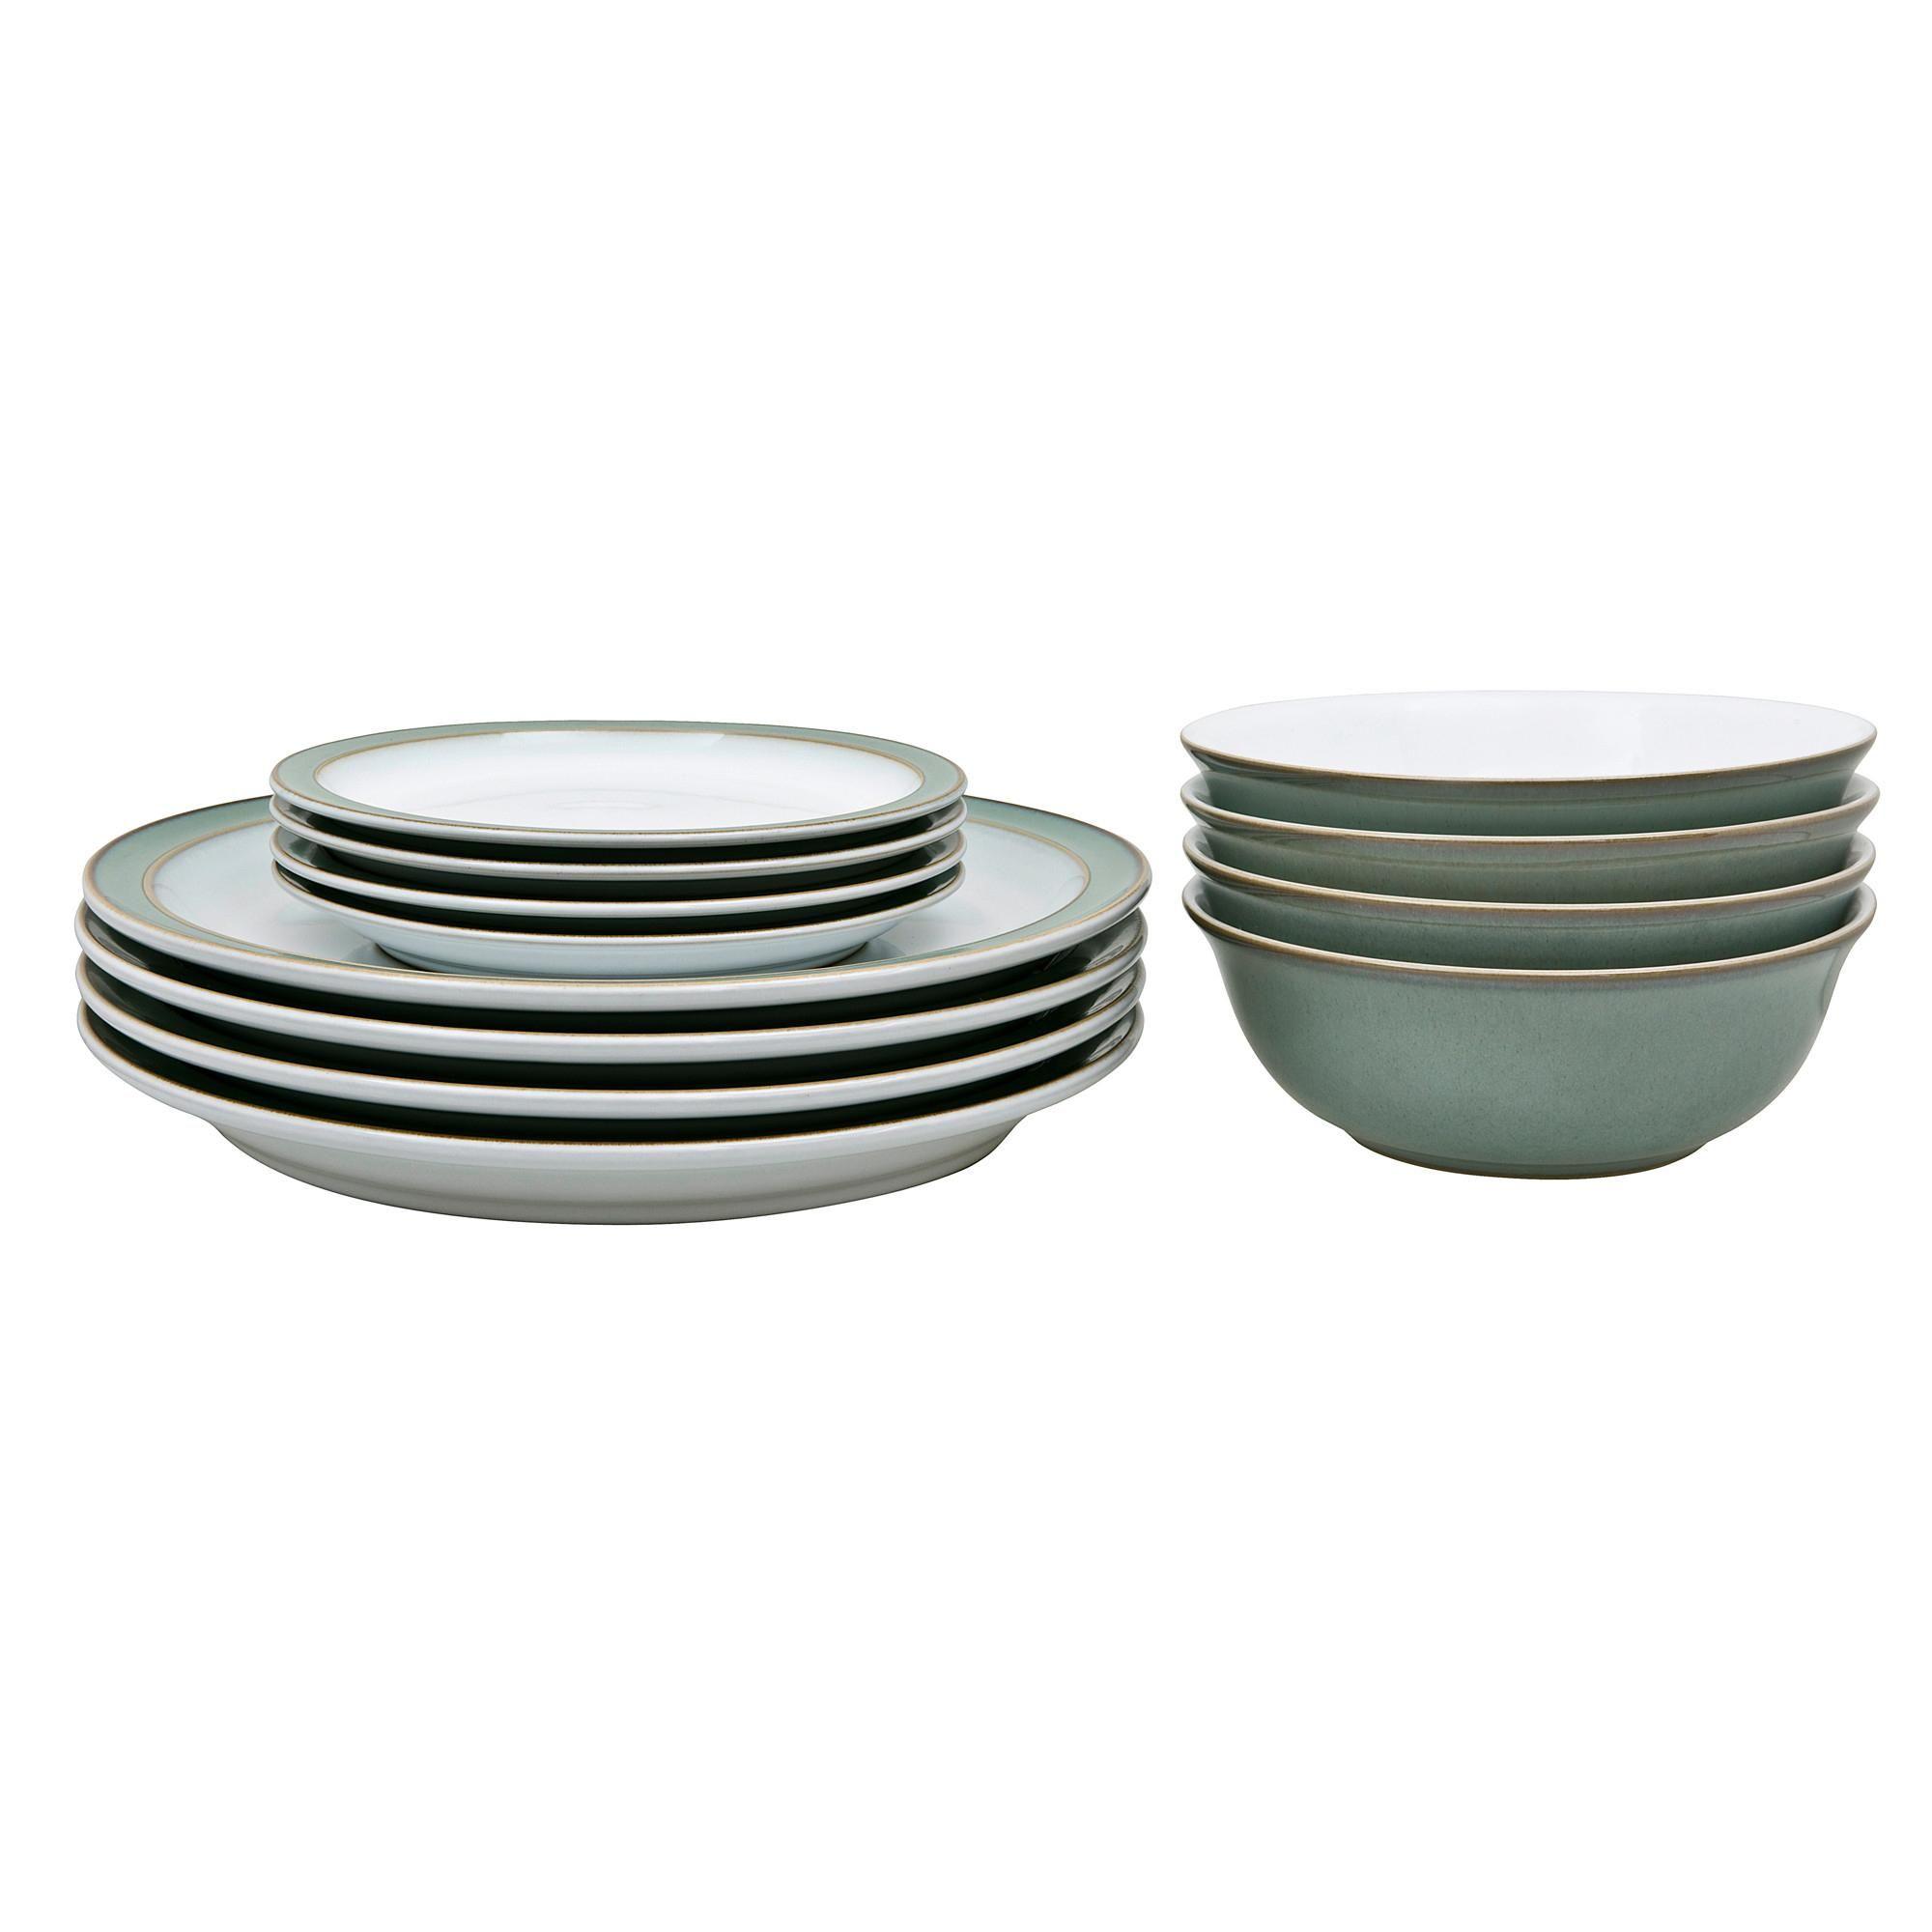 Denby Regency Green 12 Piece Dinner Set In 2020 Dinner Sets Kitchenaid Artisan Mixer Denby Pottery